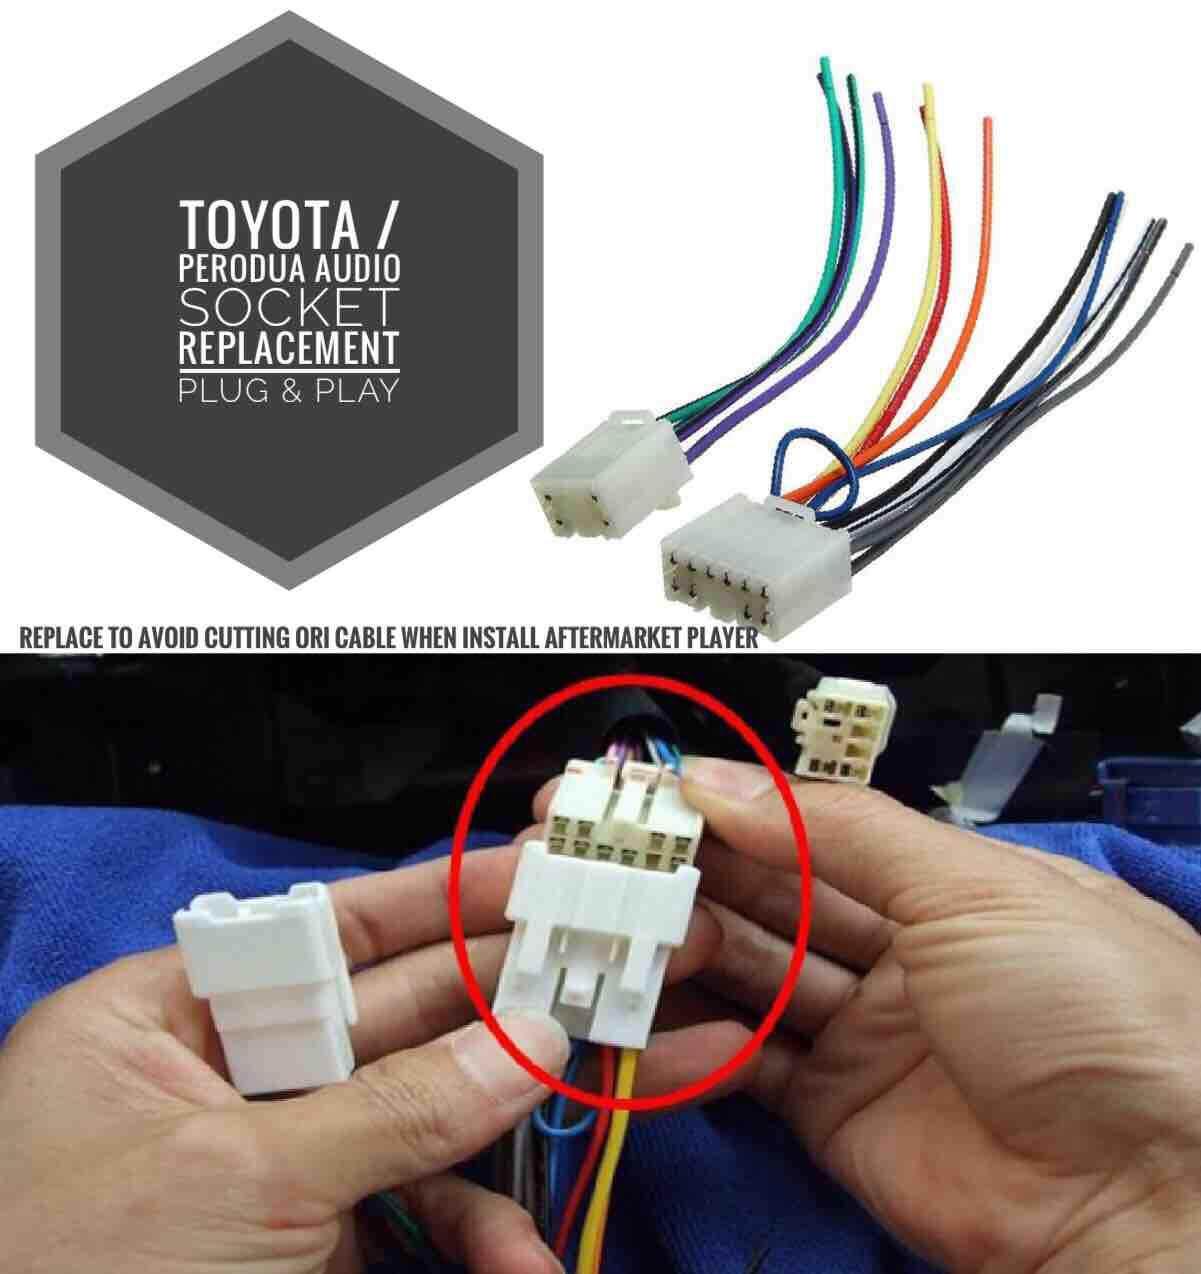 Toyota Perodua Audio Wiring Socket Replacement Plug And Play Oem Fitment By Kaki Kereta Auto Supply Sdn Bhd.